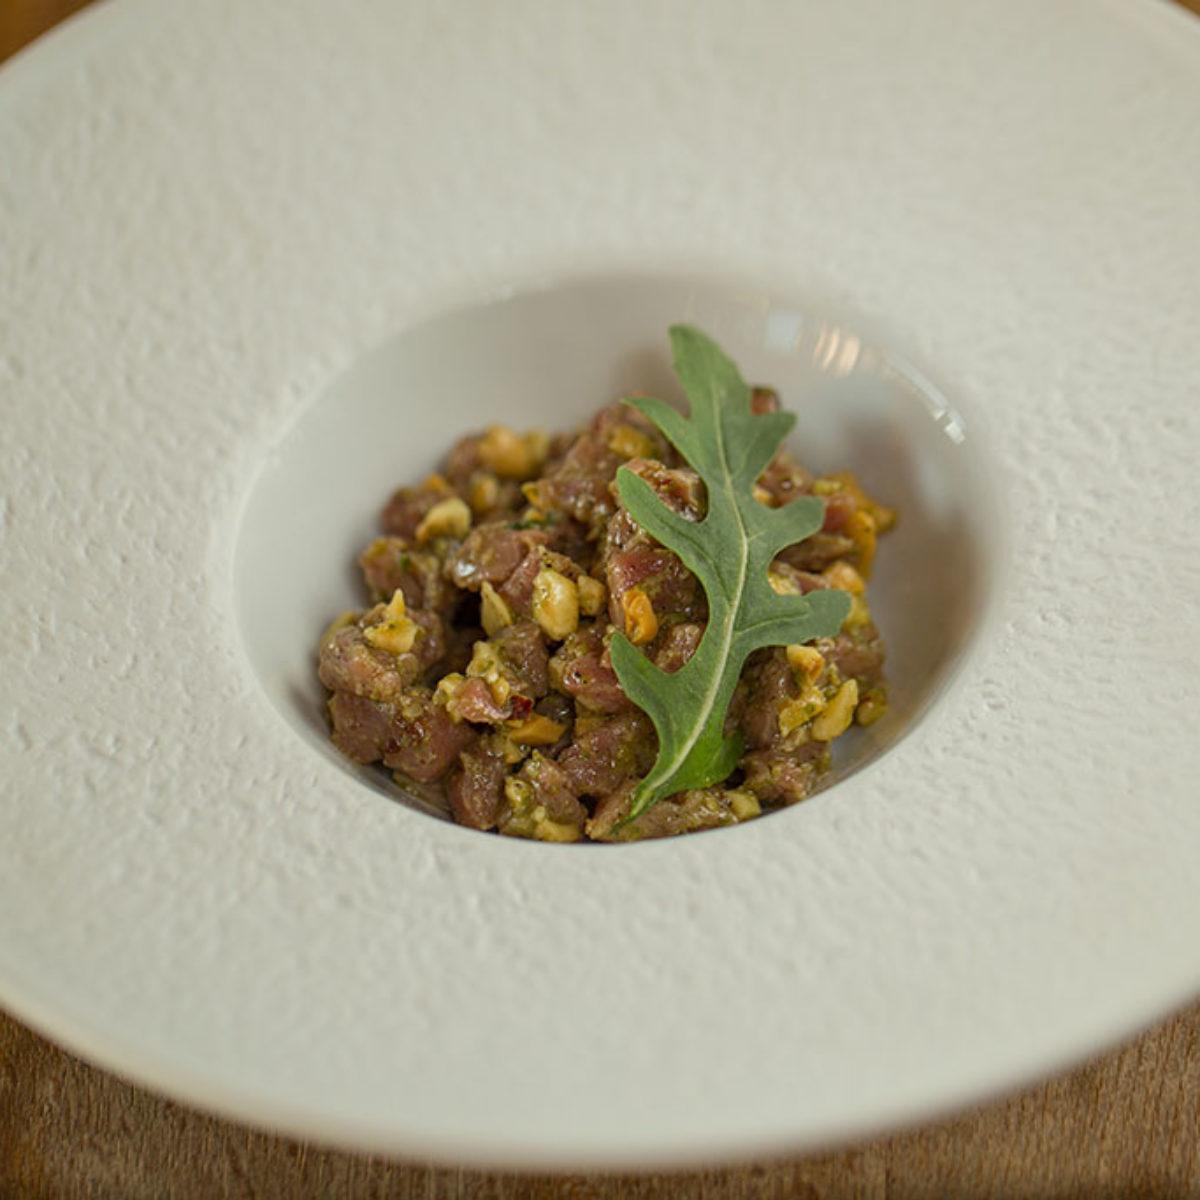 Yiamas Gastro Bar - Restaurant Καλαμάτα - Μοντέρνα Ευρωπαϊκή Κουζίνα menu 4